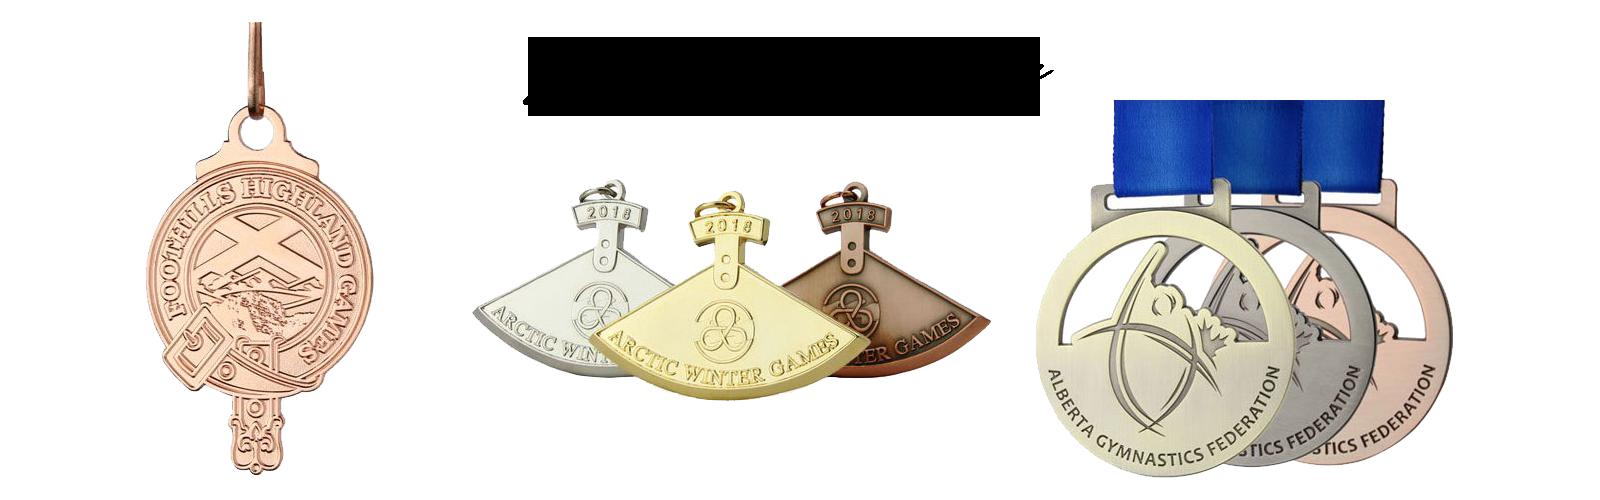 medals-custom